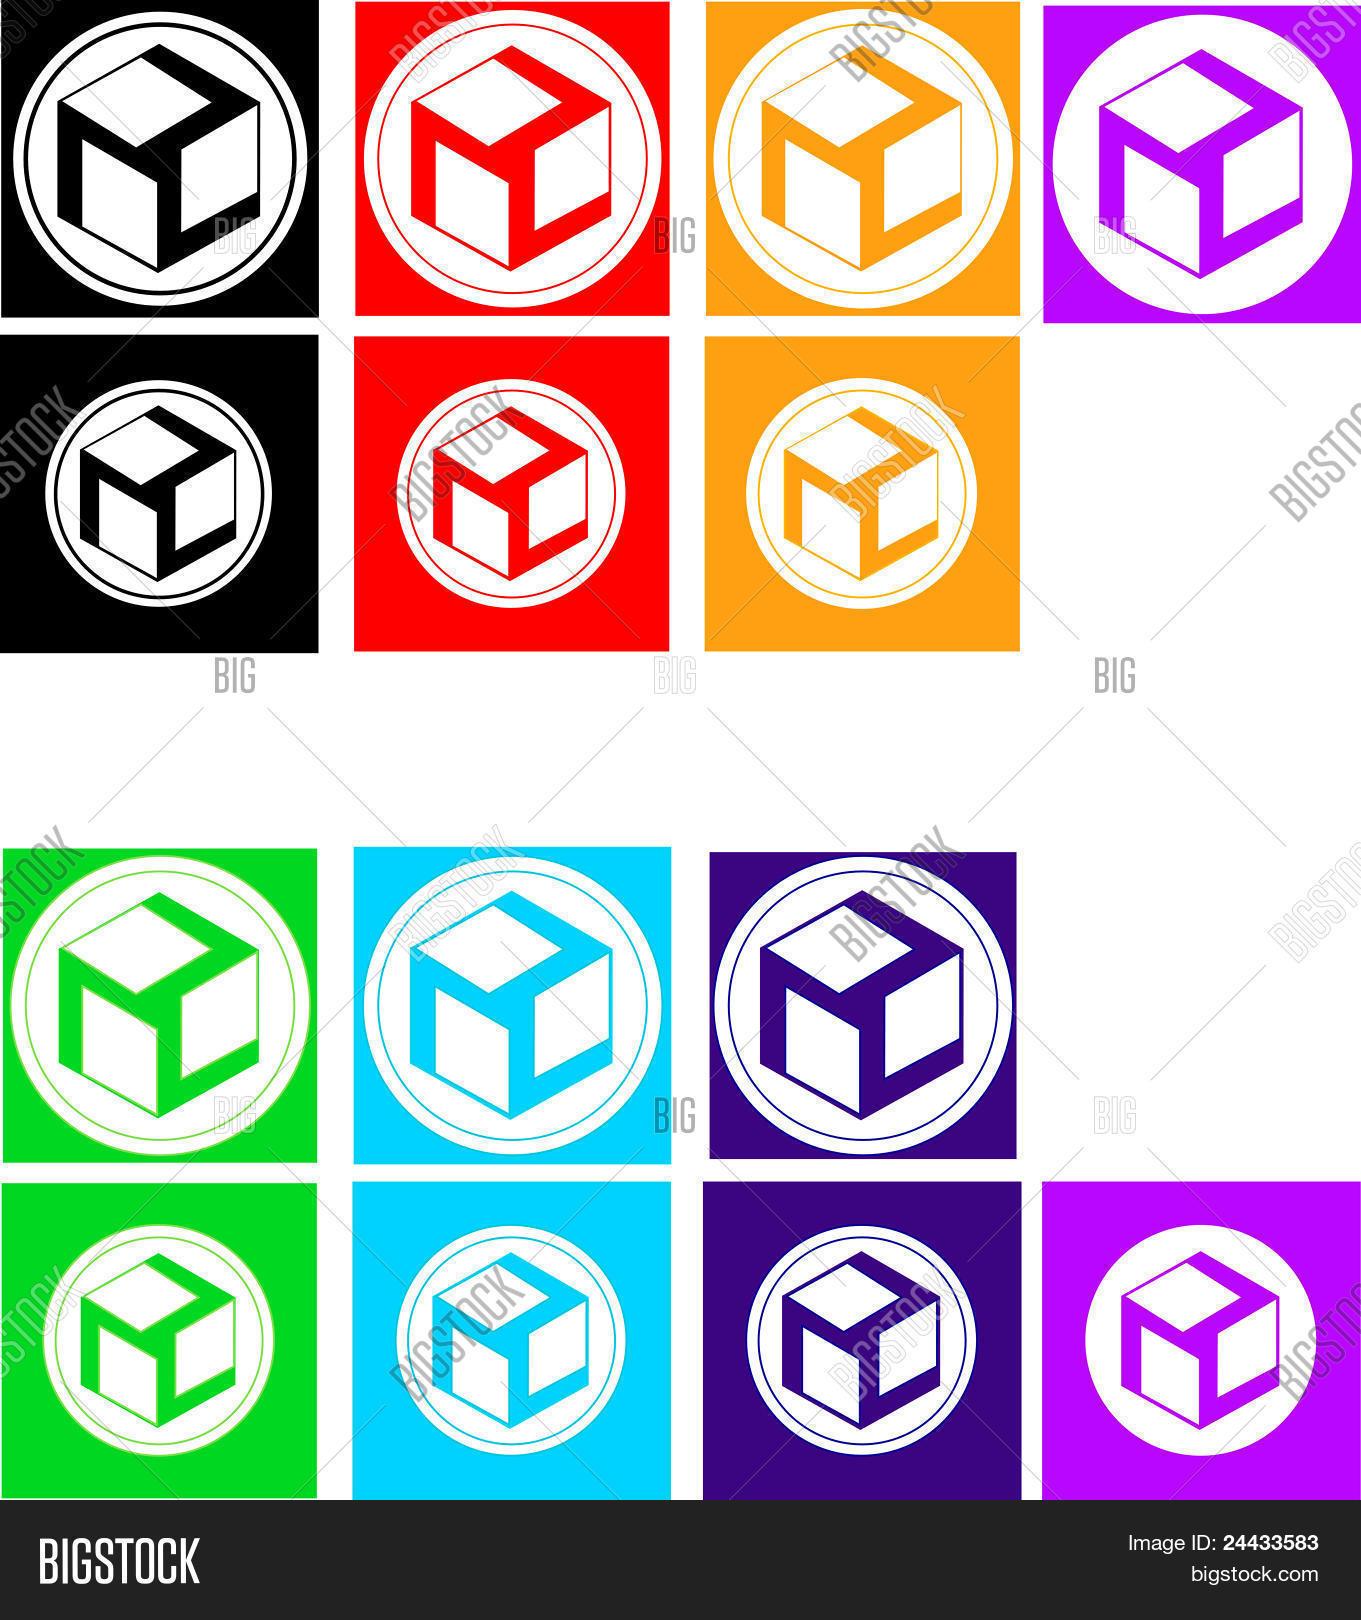 Usui Images Illustrations Vectors Free Bigstock